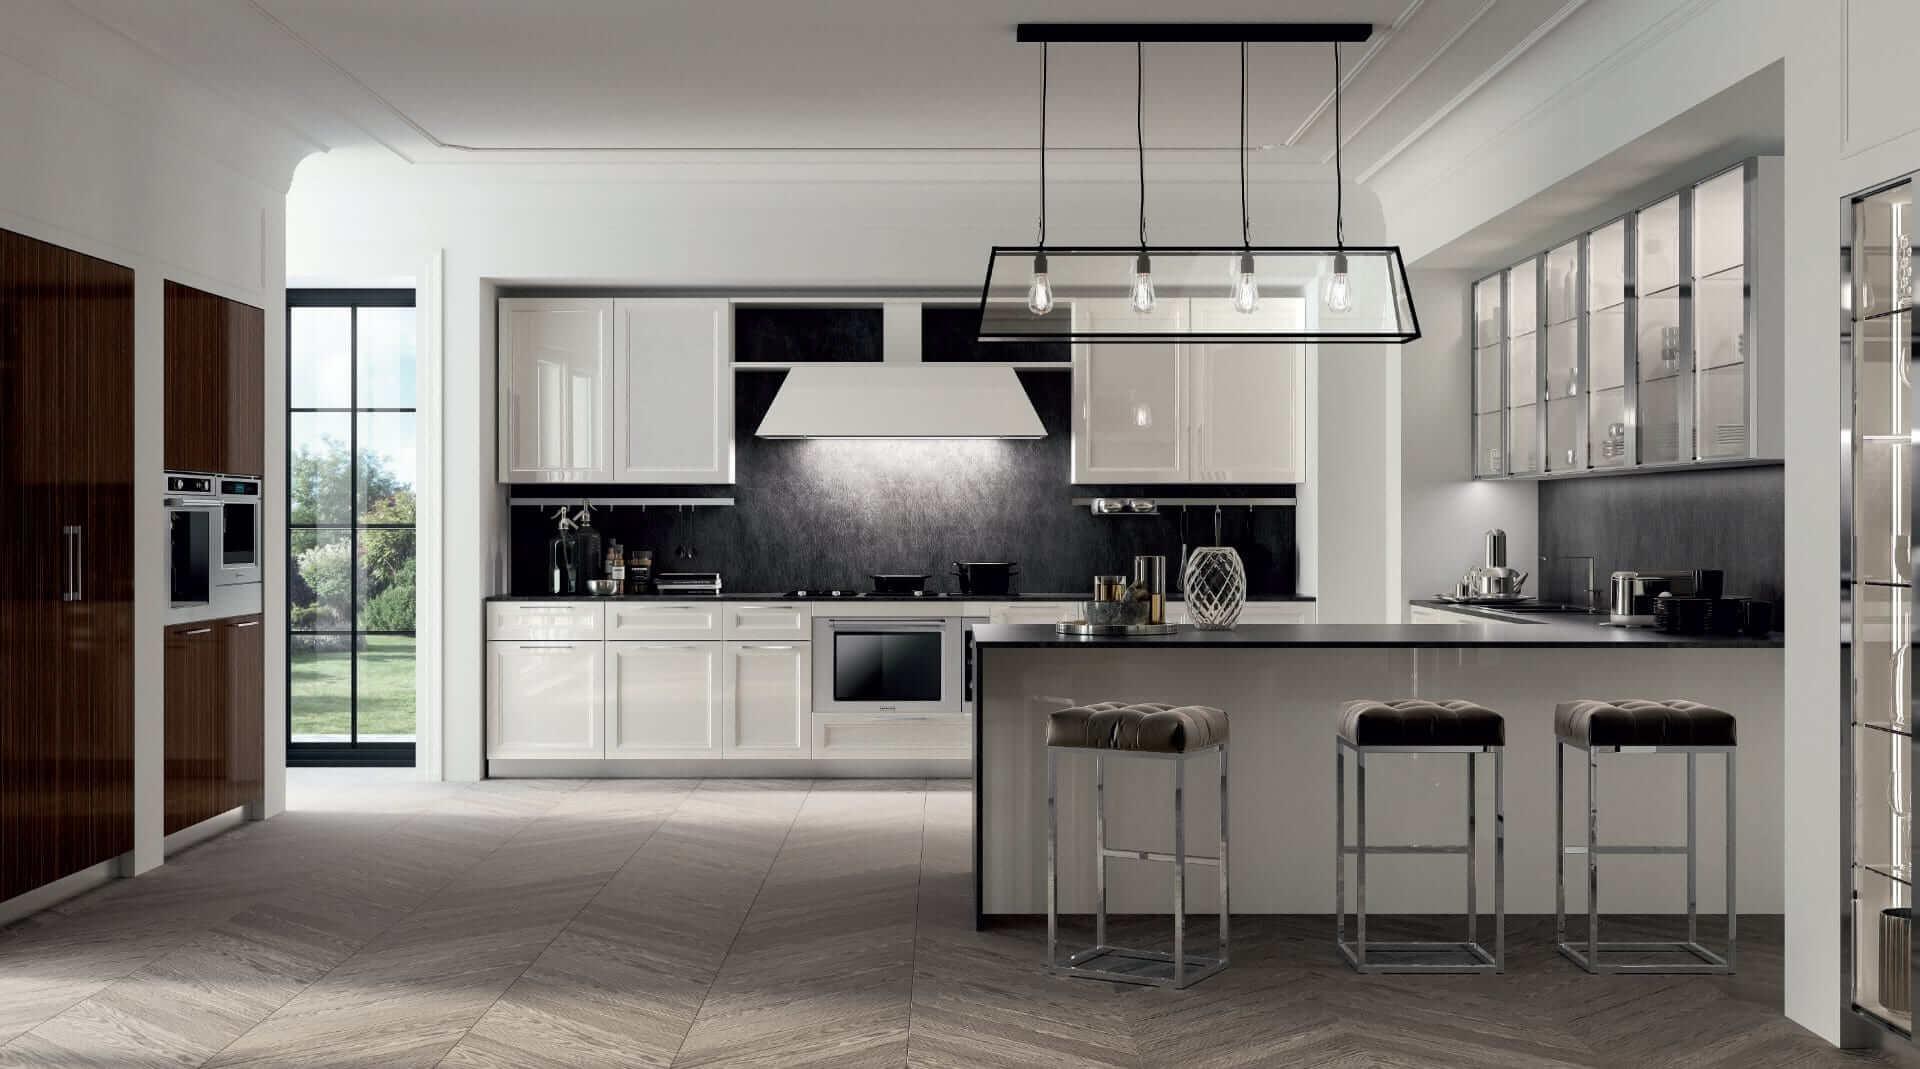 marilyn-cucina-design-chic-cosmopolita